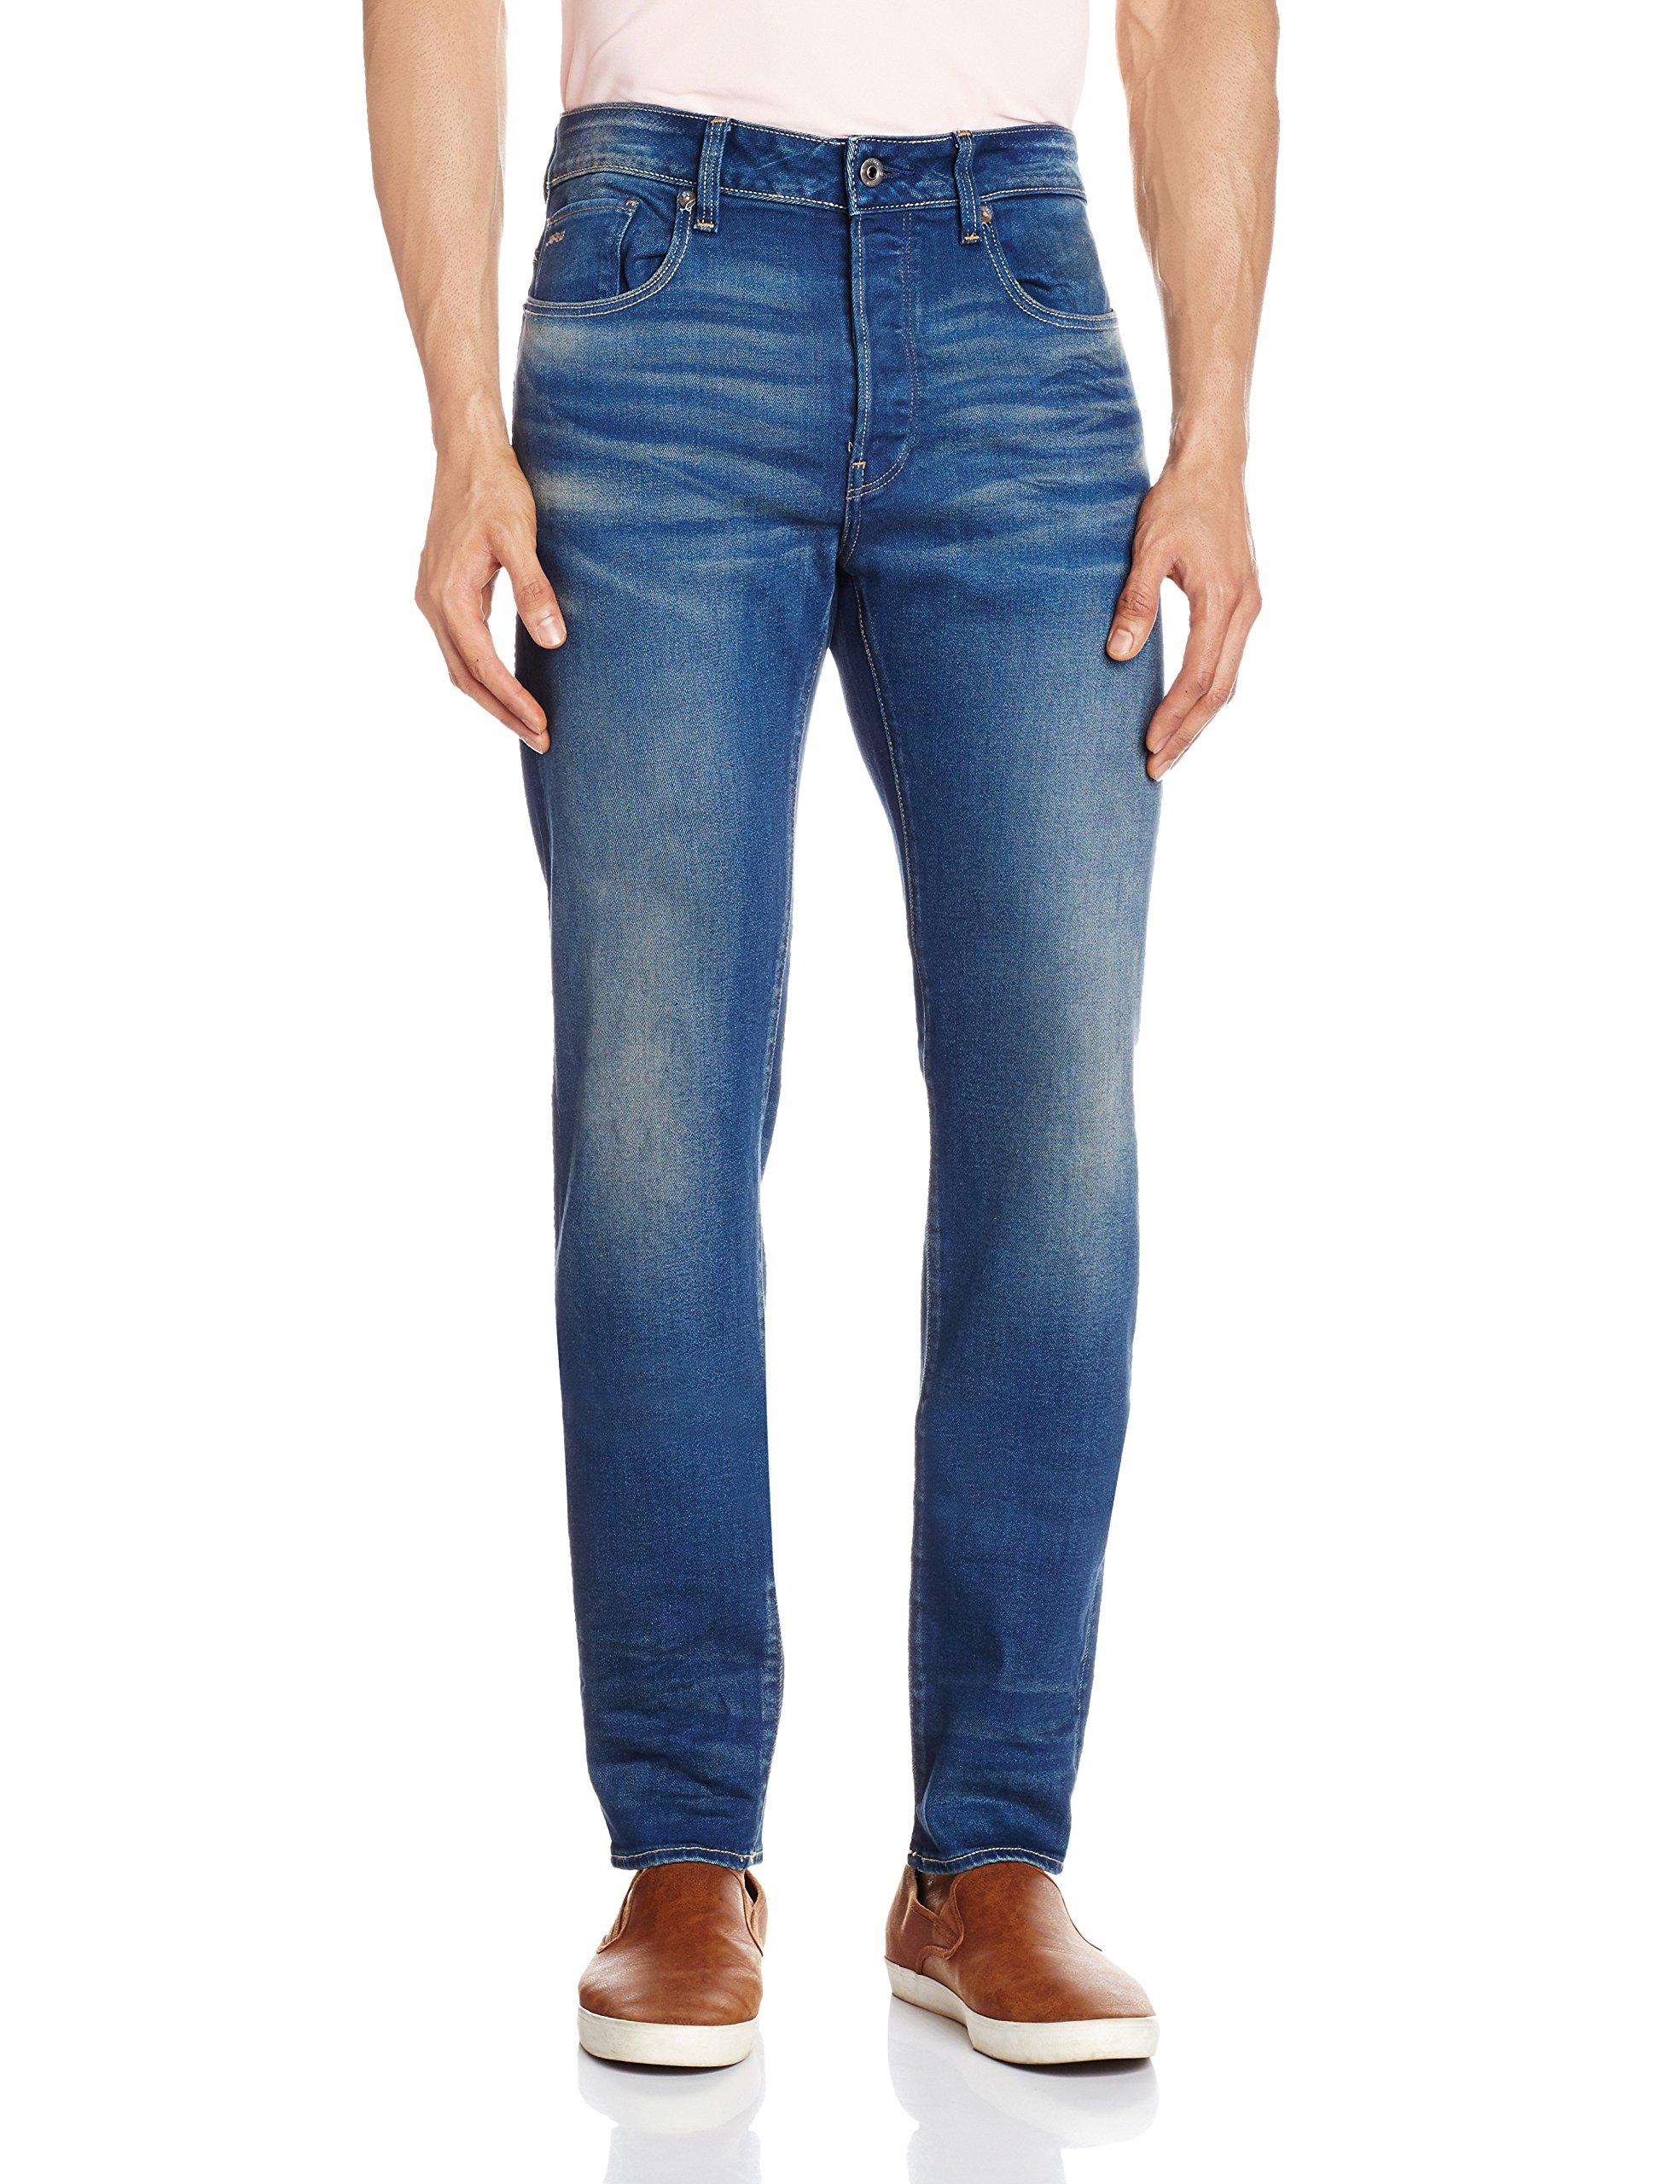 G-Star Raw Men's 3301 Slim Fit Jean In Firro Denim, Medium Aged, 33x34